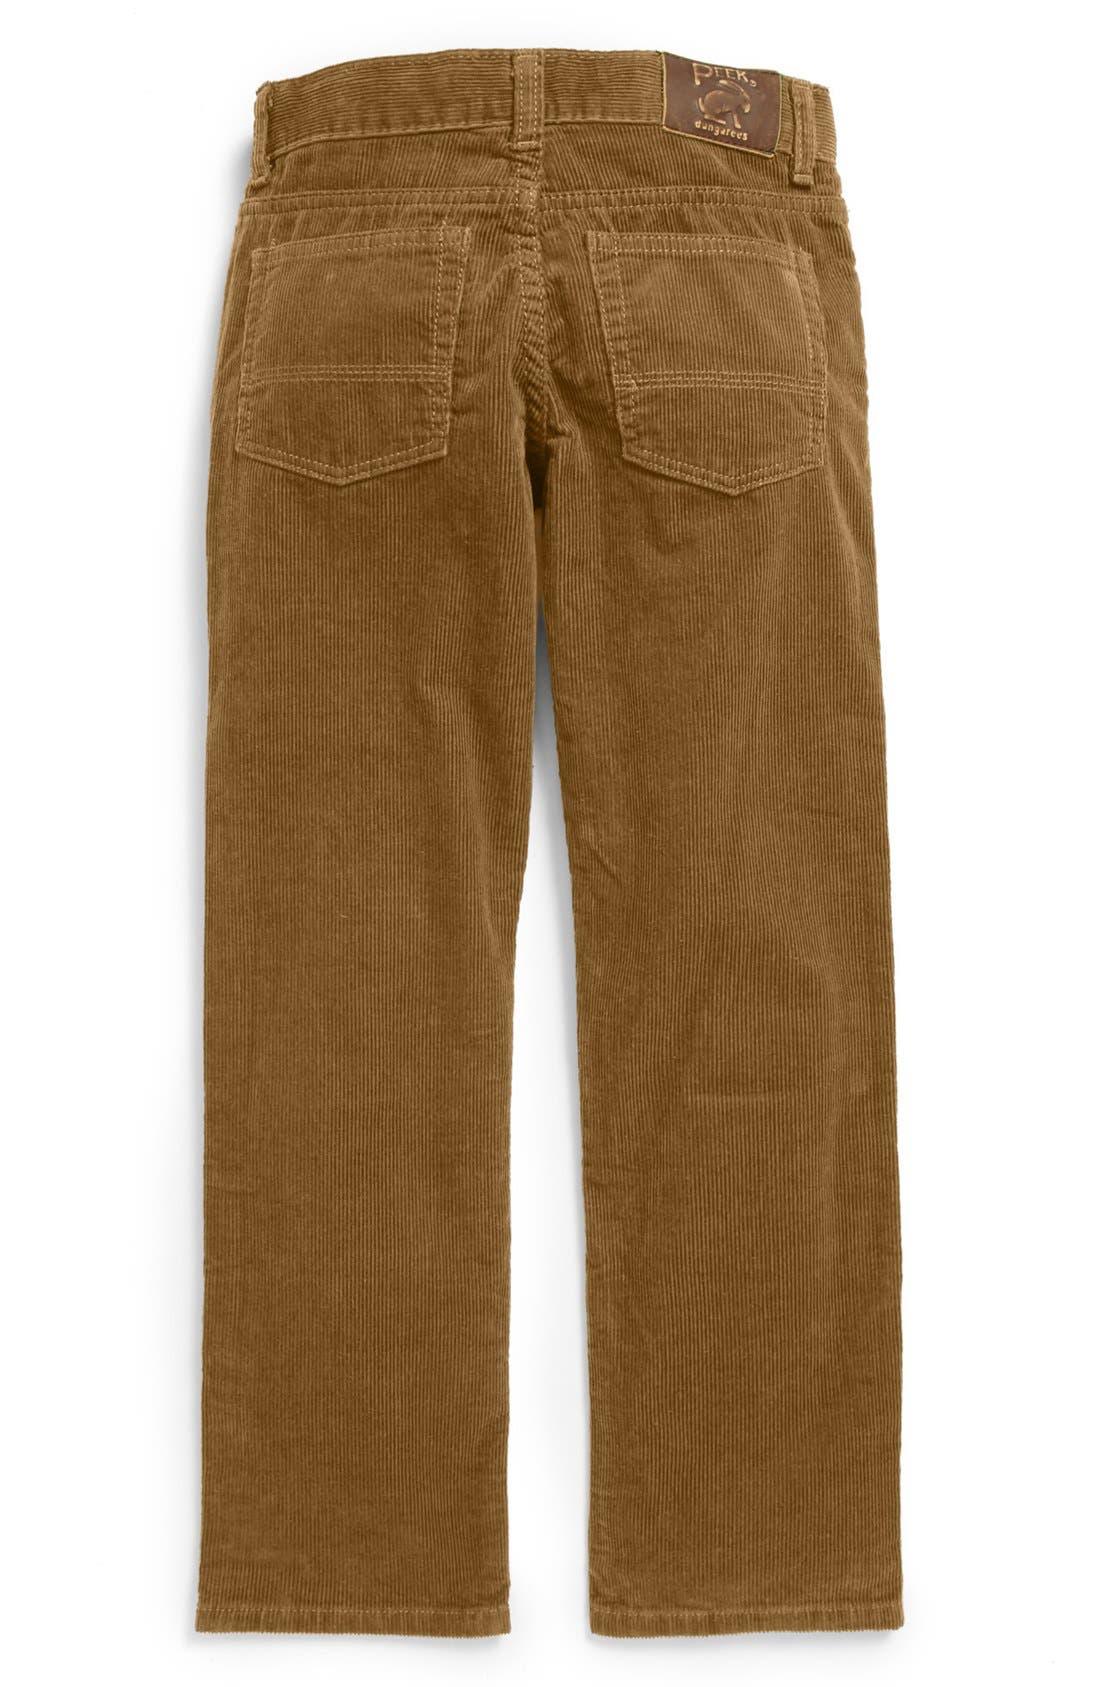 Alternate Image 2  - Peek 'Ellis' Slim Corduroy Pants (Toddler Boys, Little Boys & Big Boys)